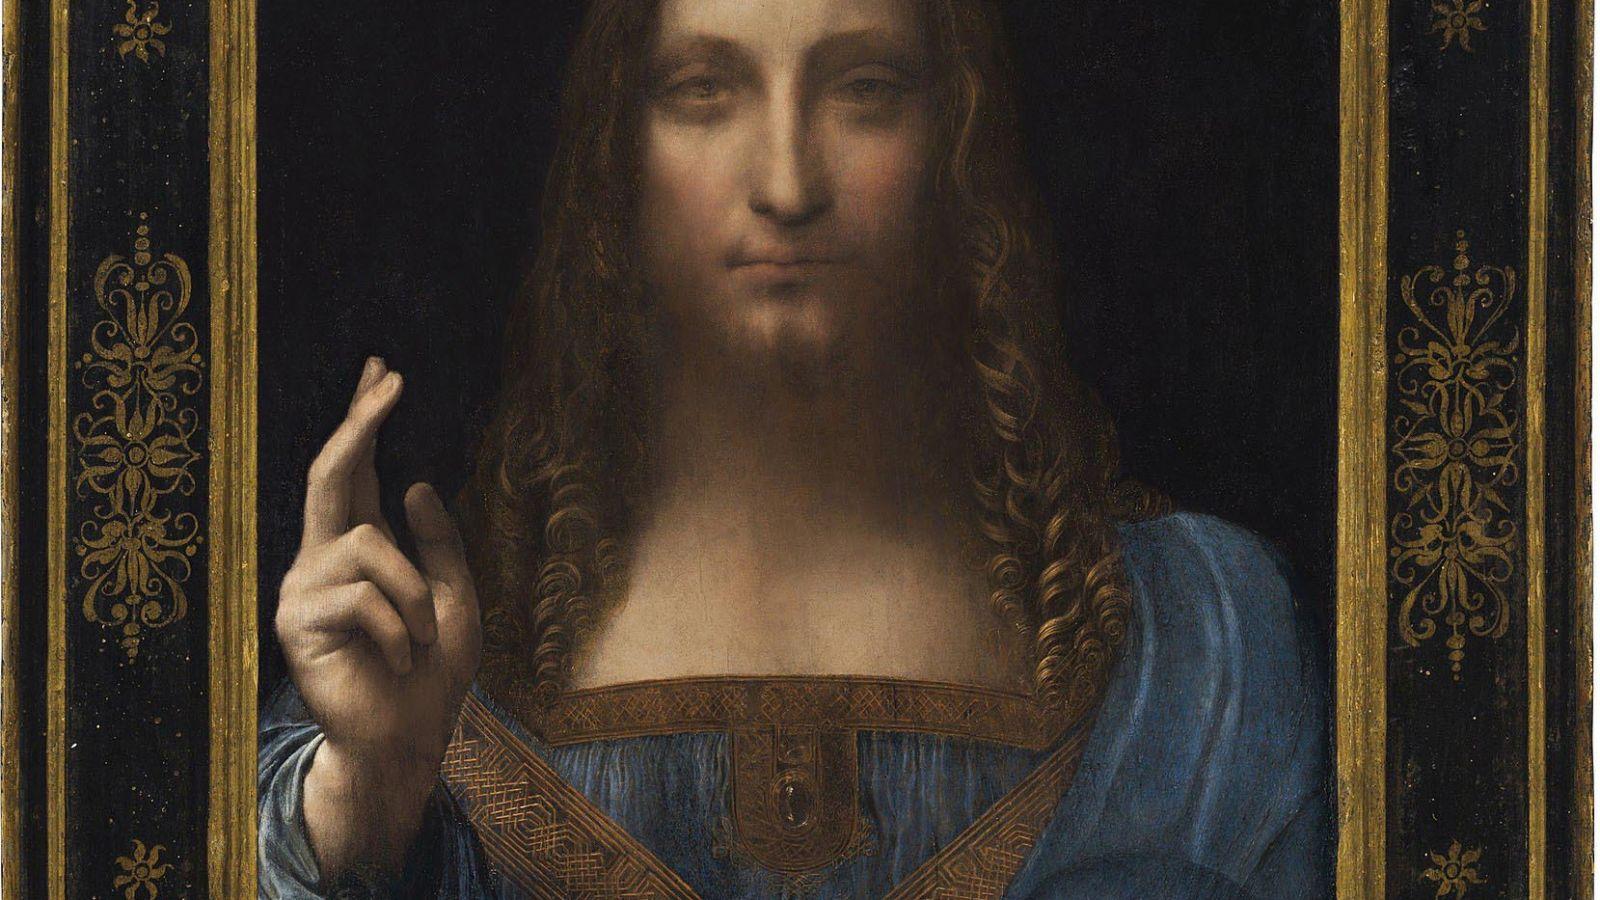 Leonardo Da Vinci: Η περίεργη ιστορία του ακριβότερου έργου τέχνης στον κόσμο